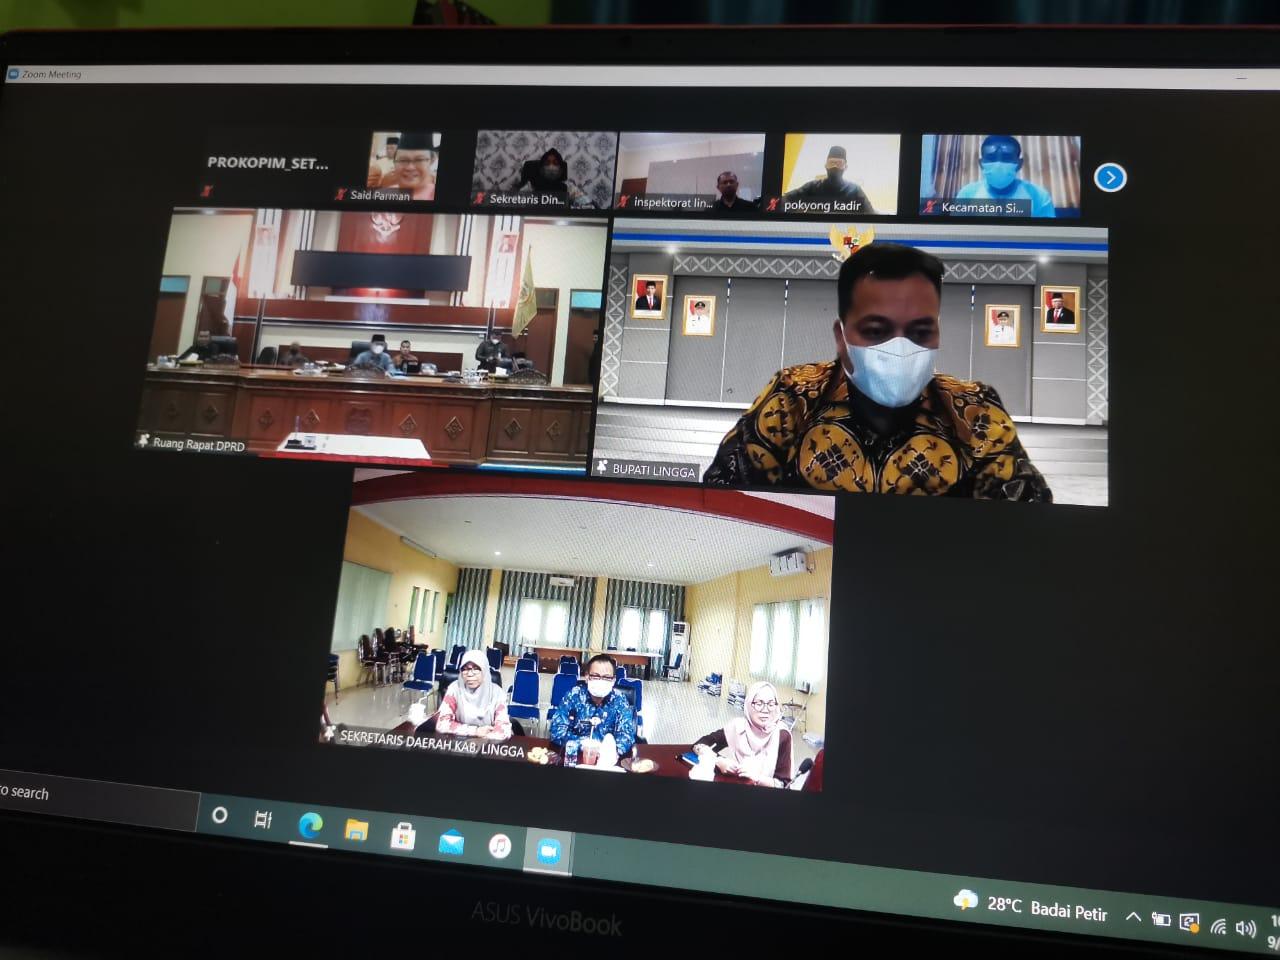 Bupati Kabupaten Lingga Mengikuti Rapat Secara Virtual Pengesahan APBD-P Kabupaten Lingga